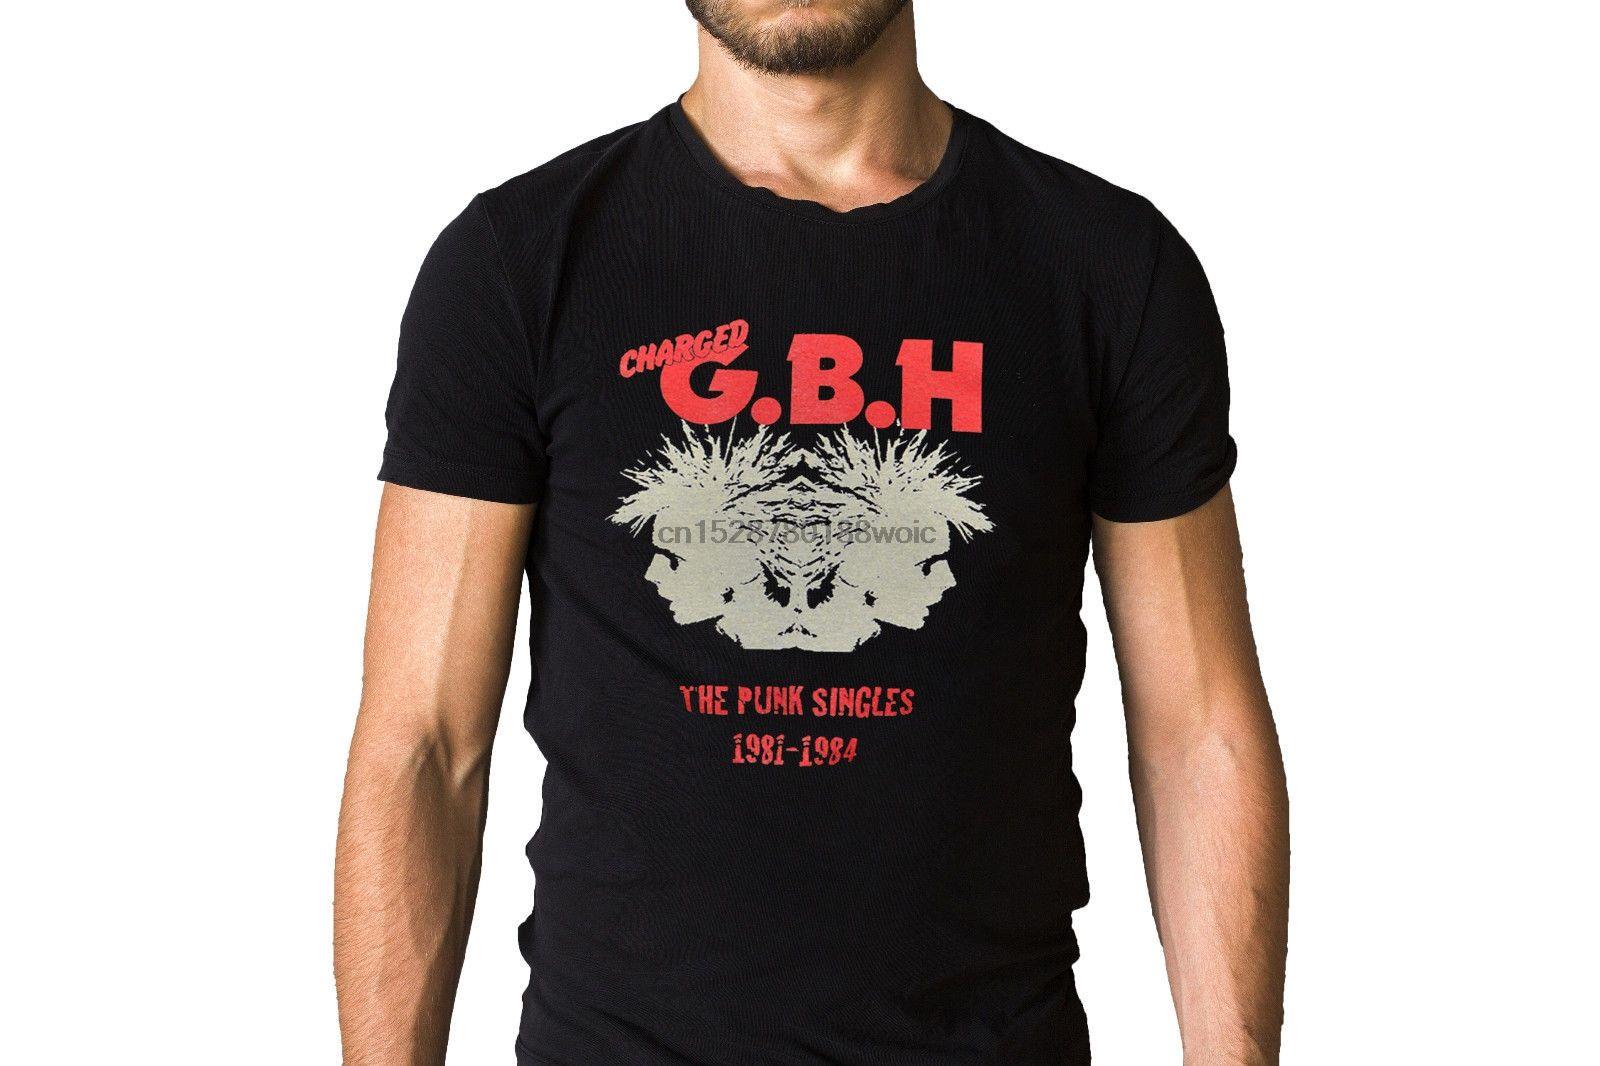 Geladene Gbh The Punk Singles 1981 1984 Cd Kunst-Abdeckung T-Shirt